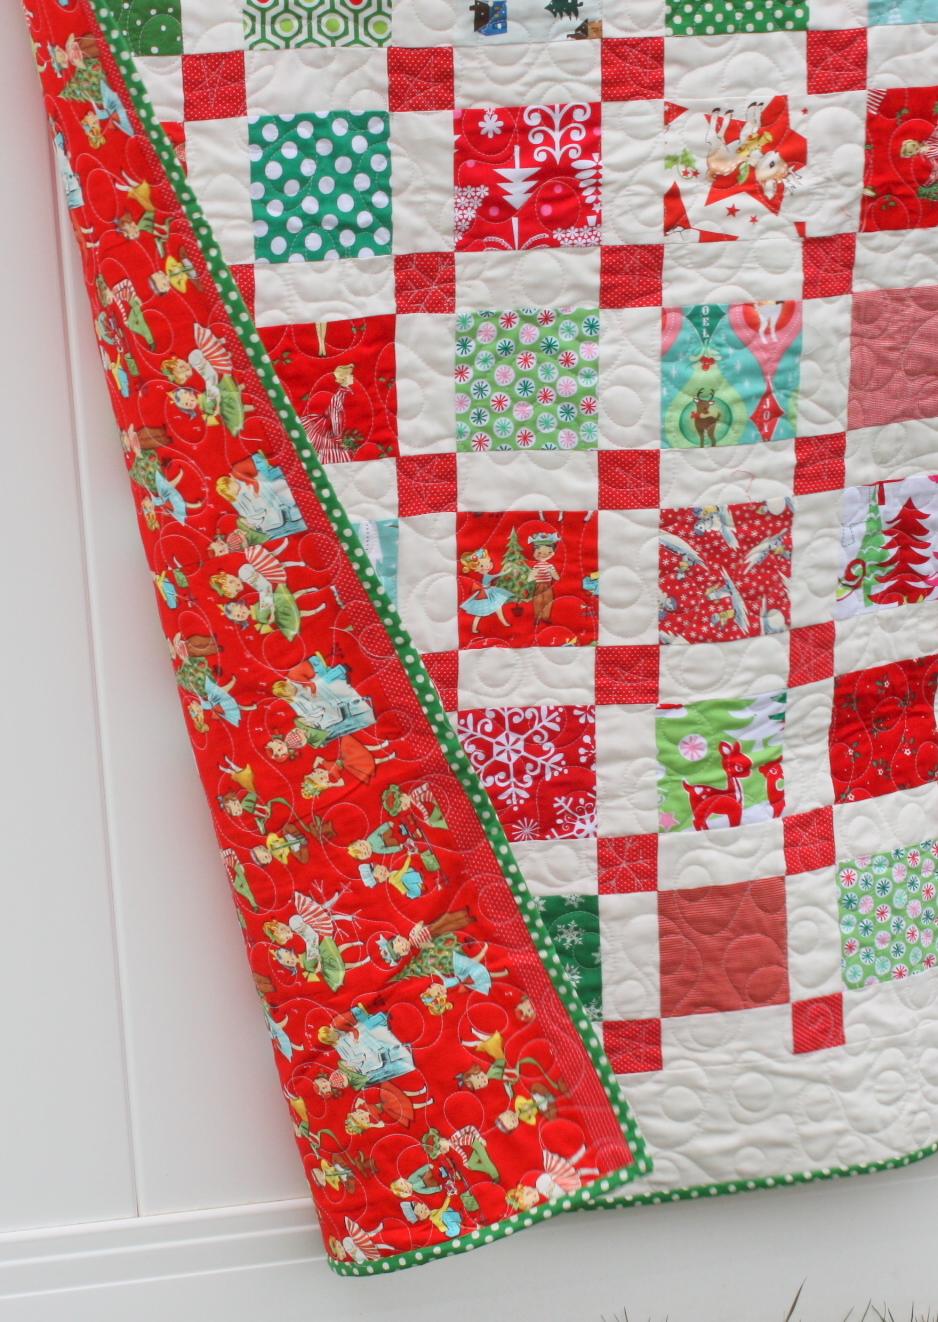 Retro Christmas Quilt - Diary of a Quilter - a quilt blog : retro quilts - Adamdwight.com